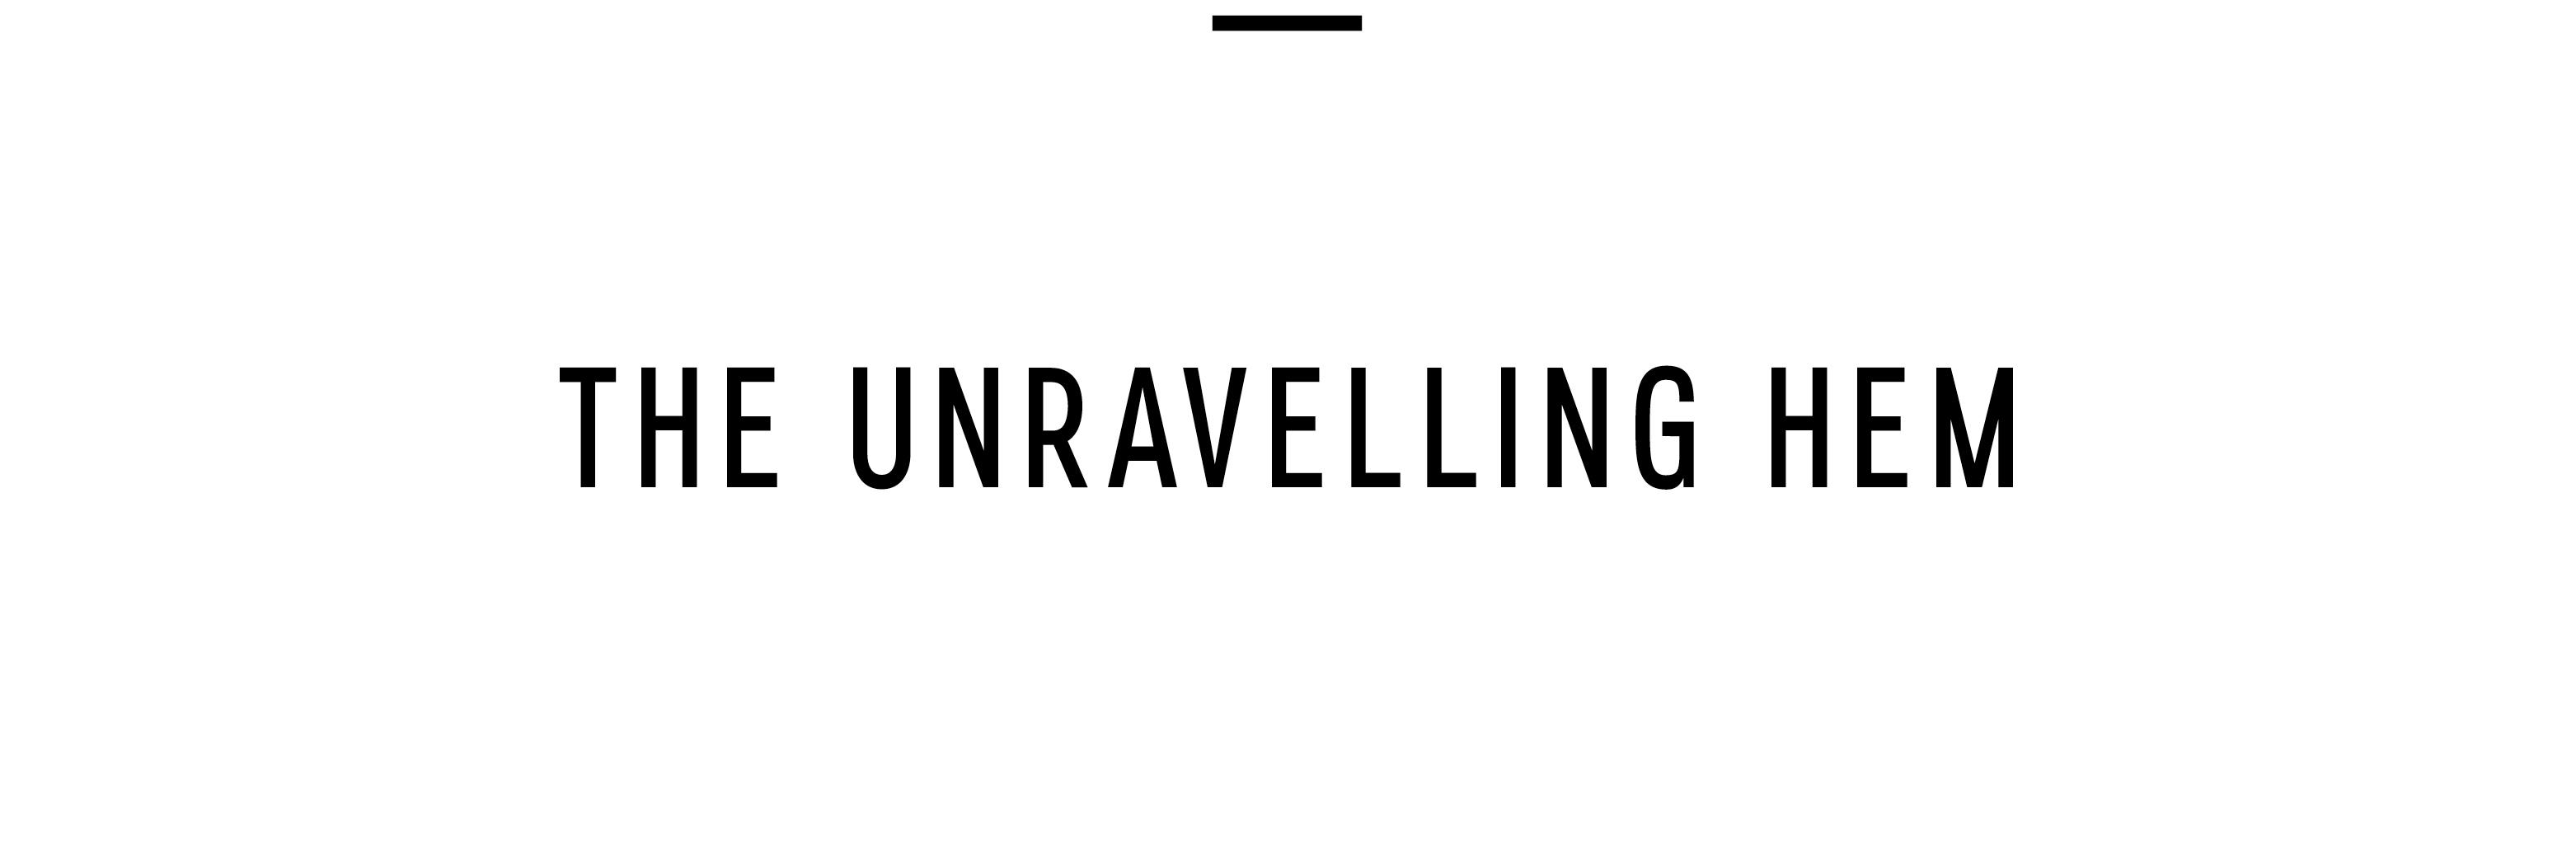 the-unraveling-hem